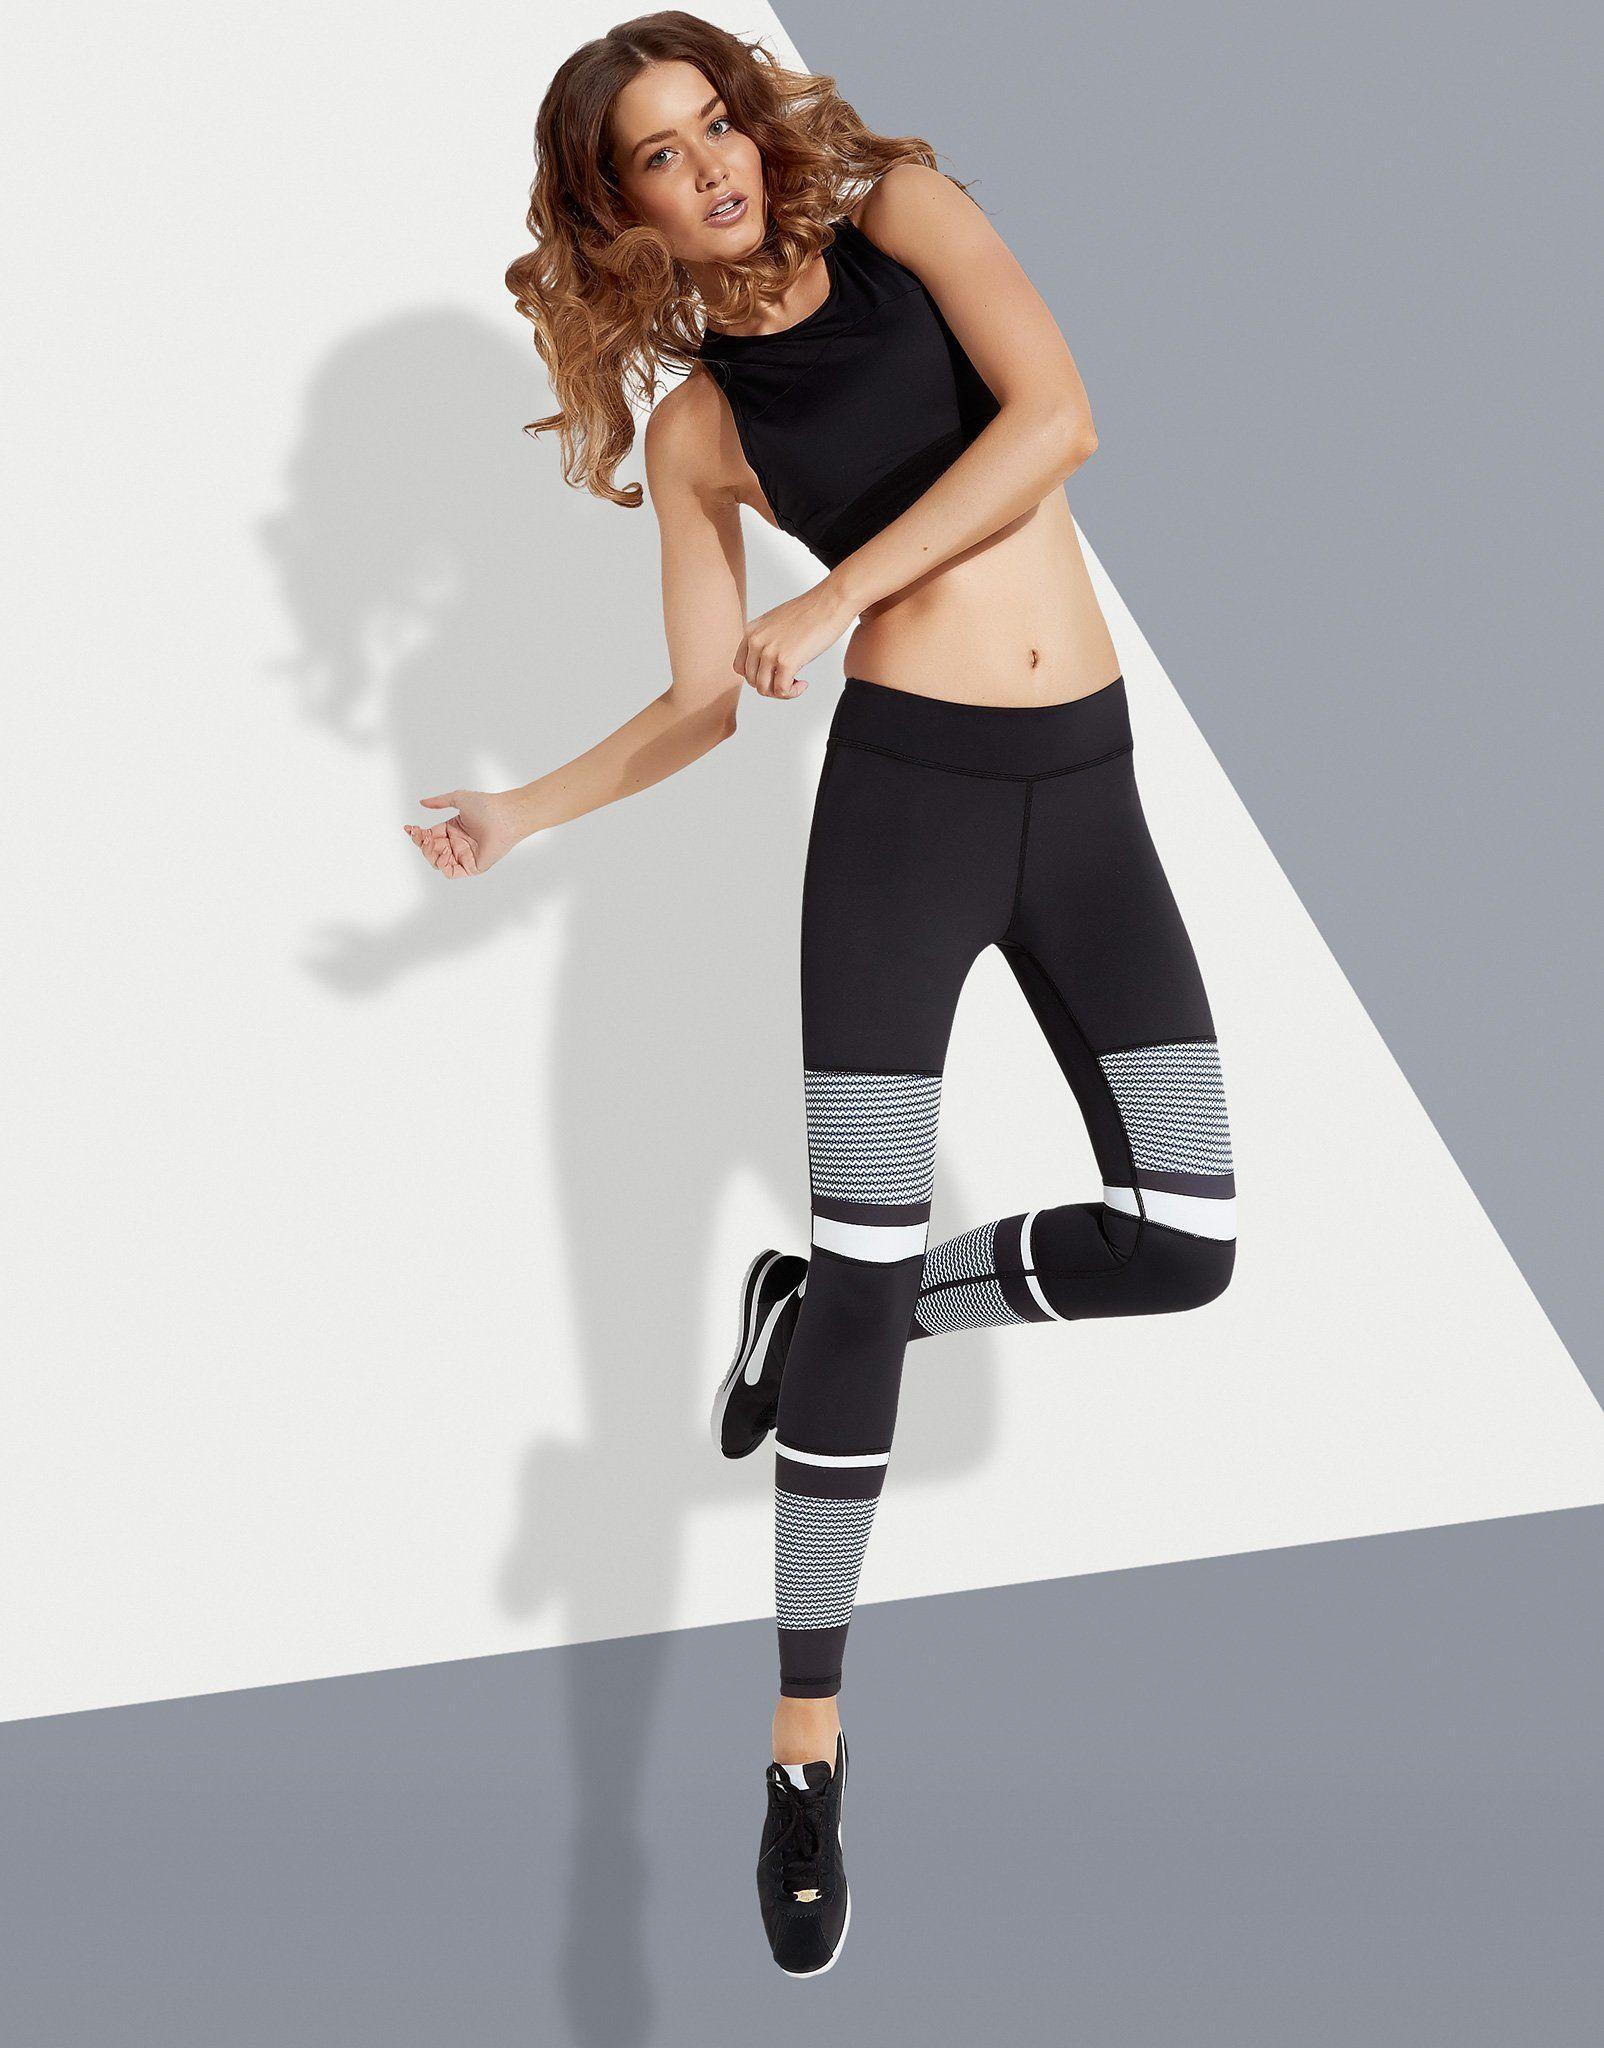 678e092f0b457d LILYBOD leggings PIA - SUPER AIR | LILYBOD Leggings | Sports ...